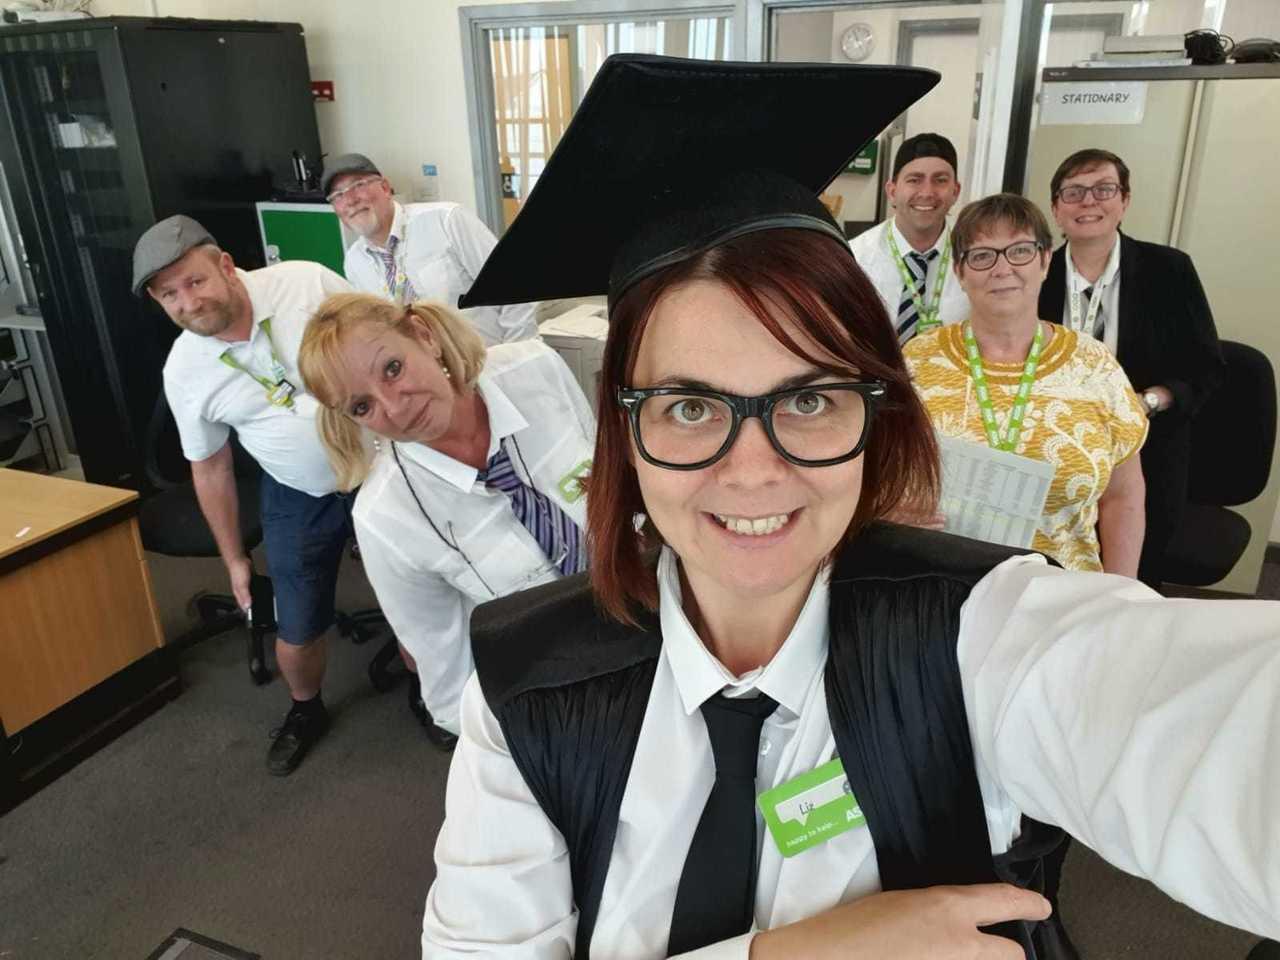 Back to school | Asda Kingshill